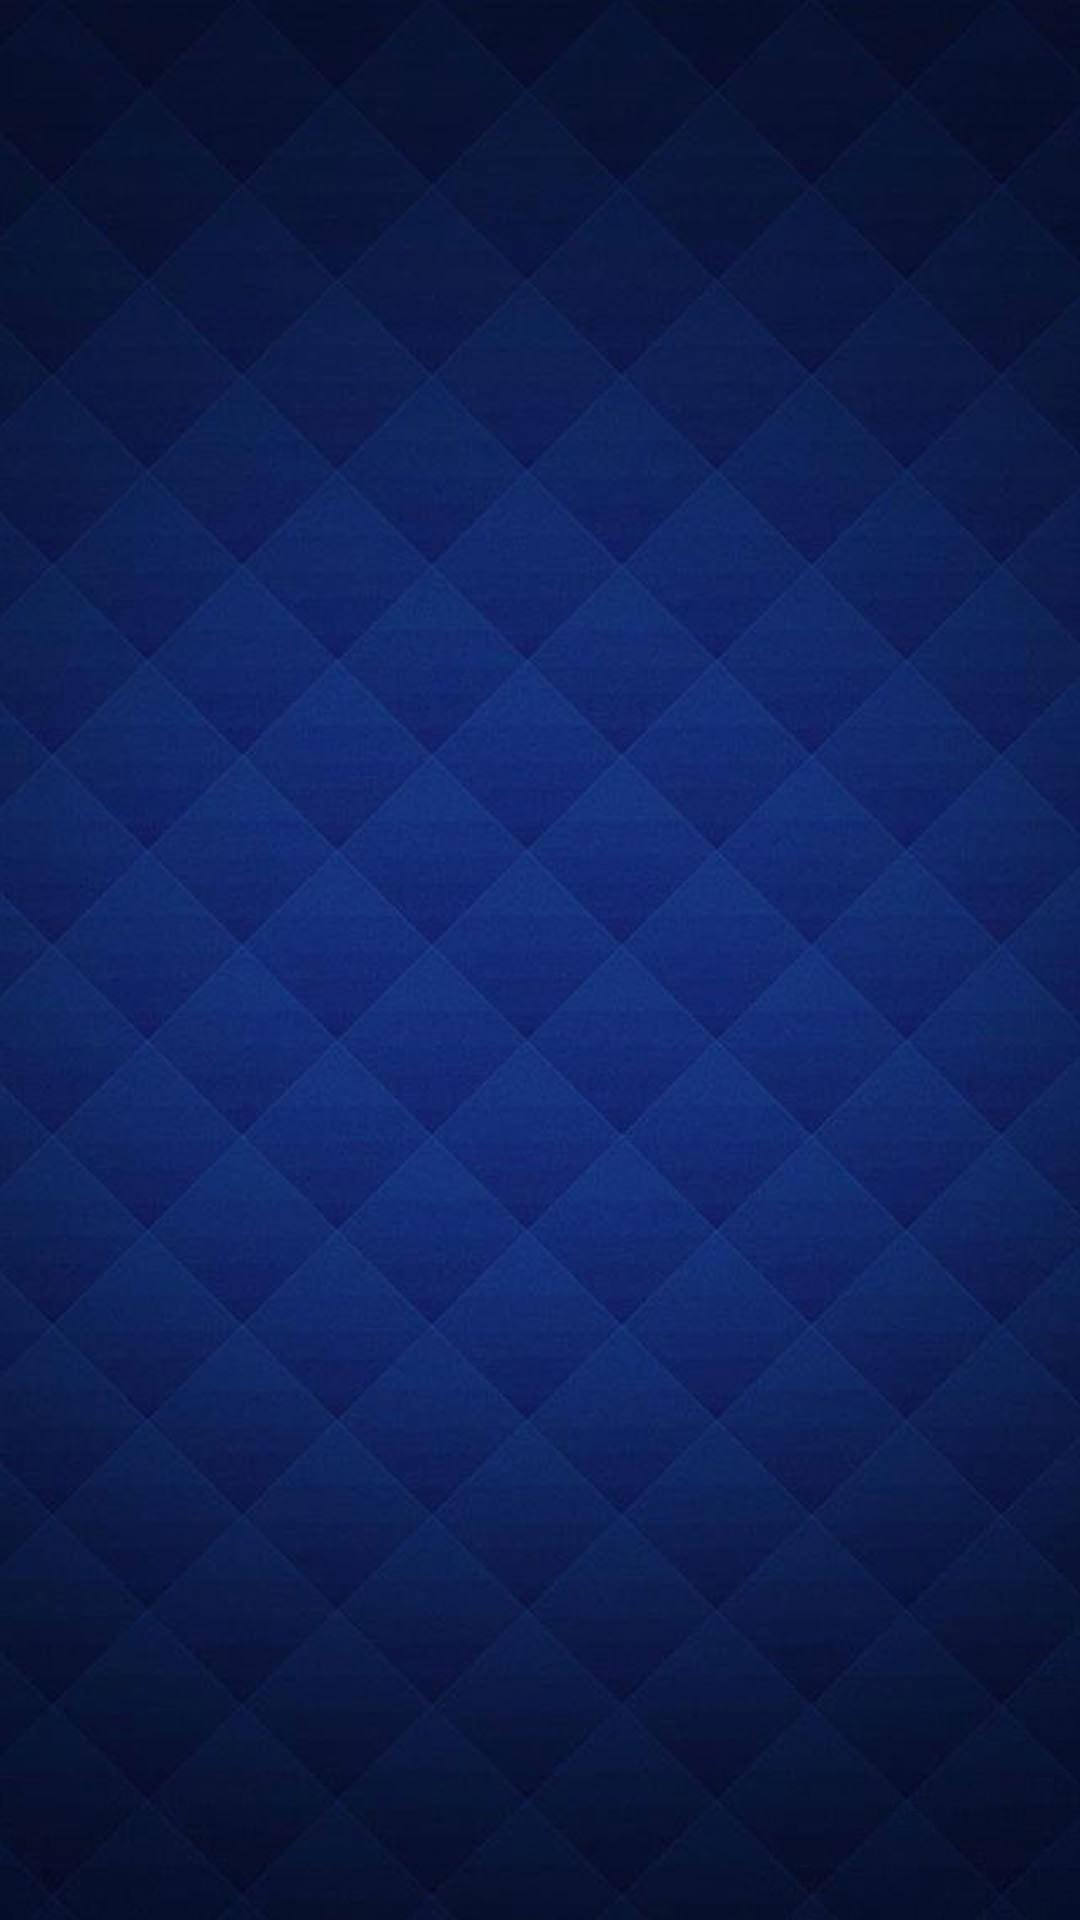 Dark Blue Iphone Wallpaper 濃紺の Iphone6 Plus壁紙 Wallpaperbox